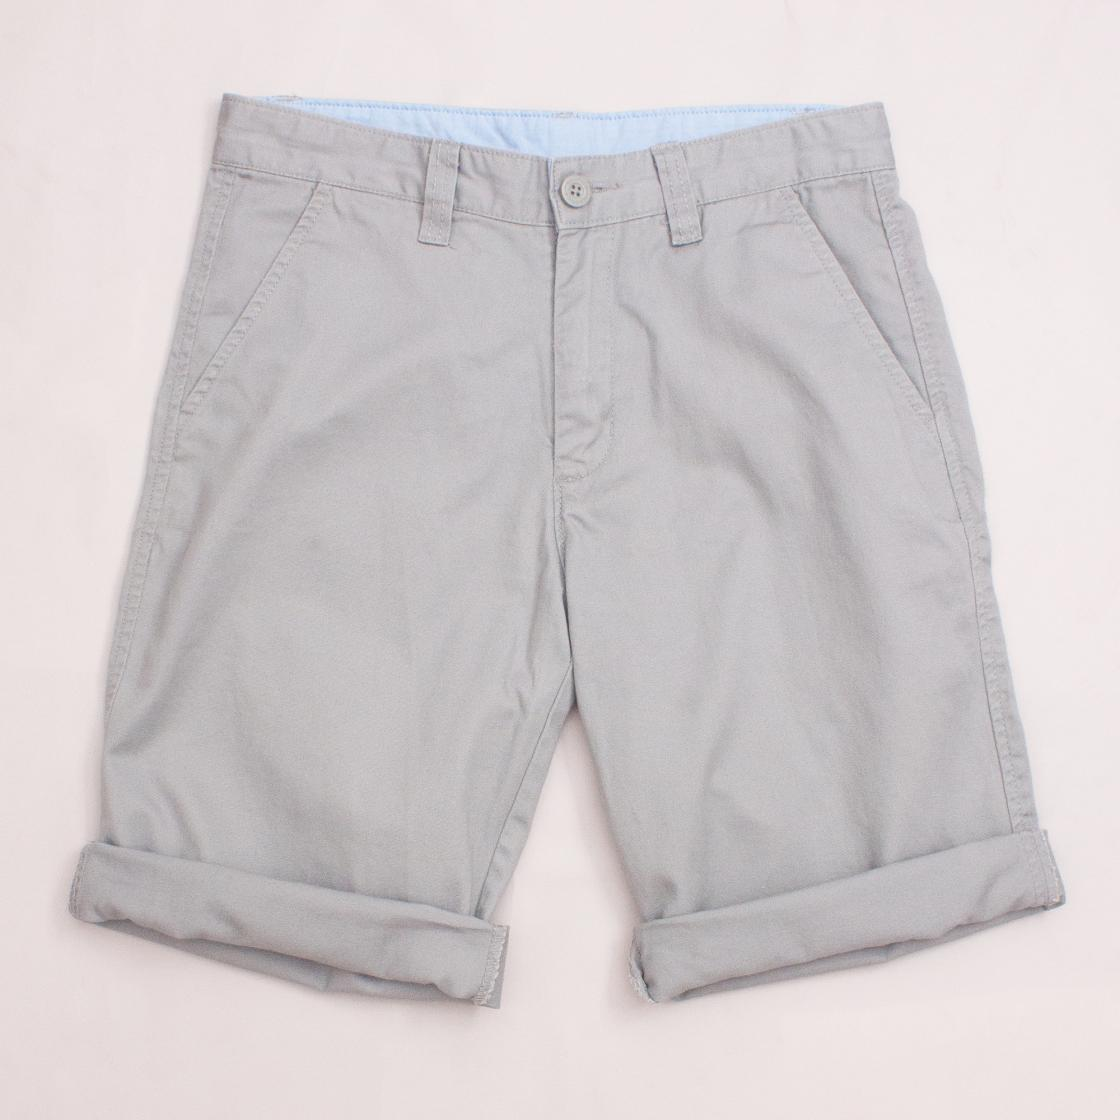 Nautica Grey Shorts